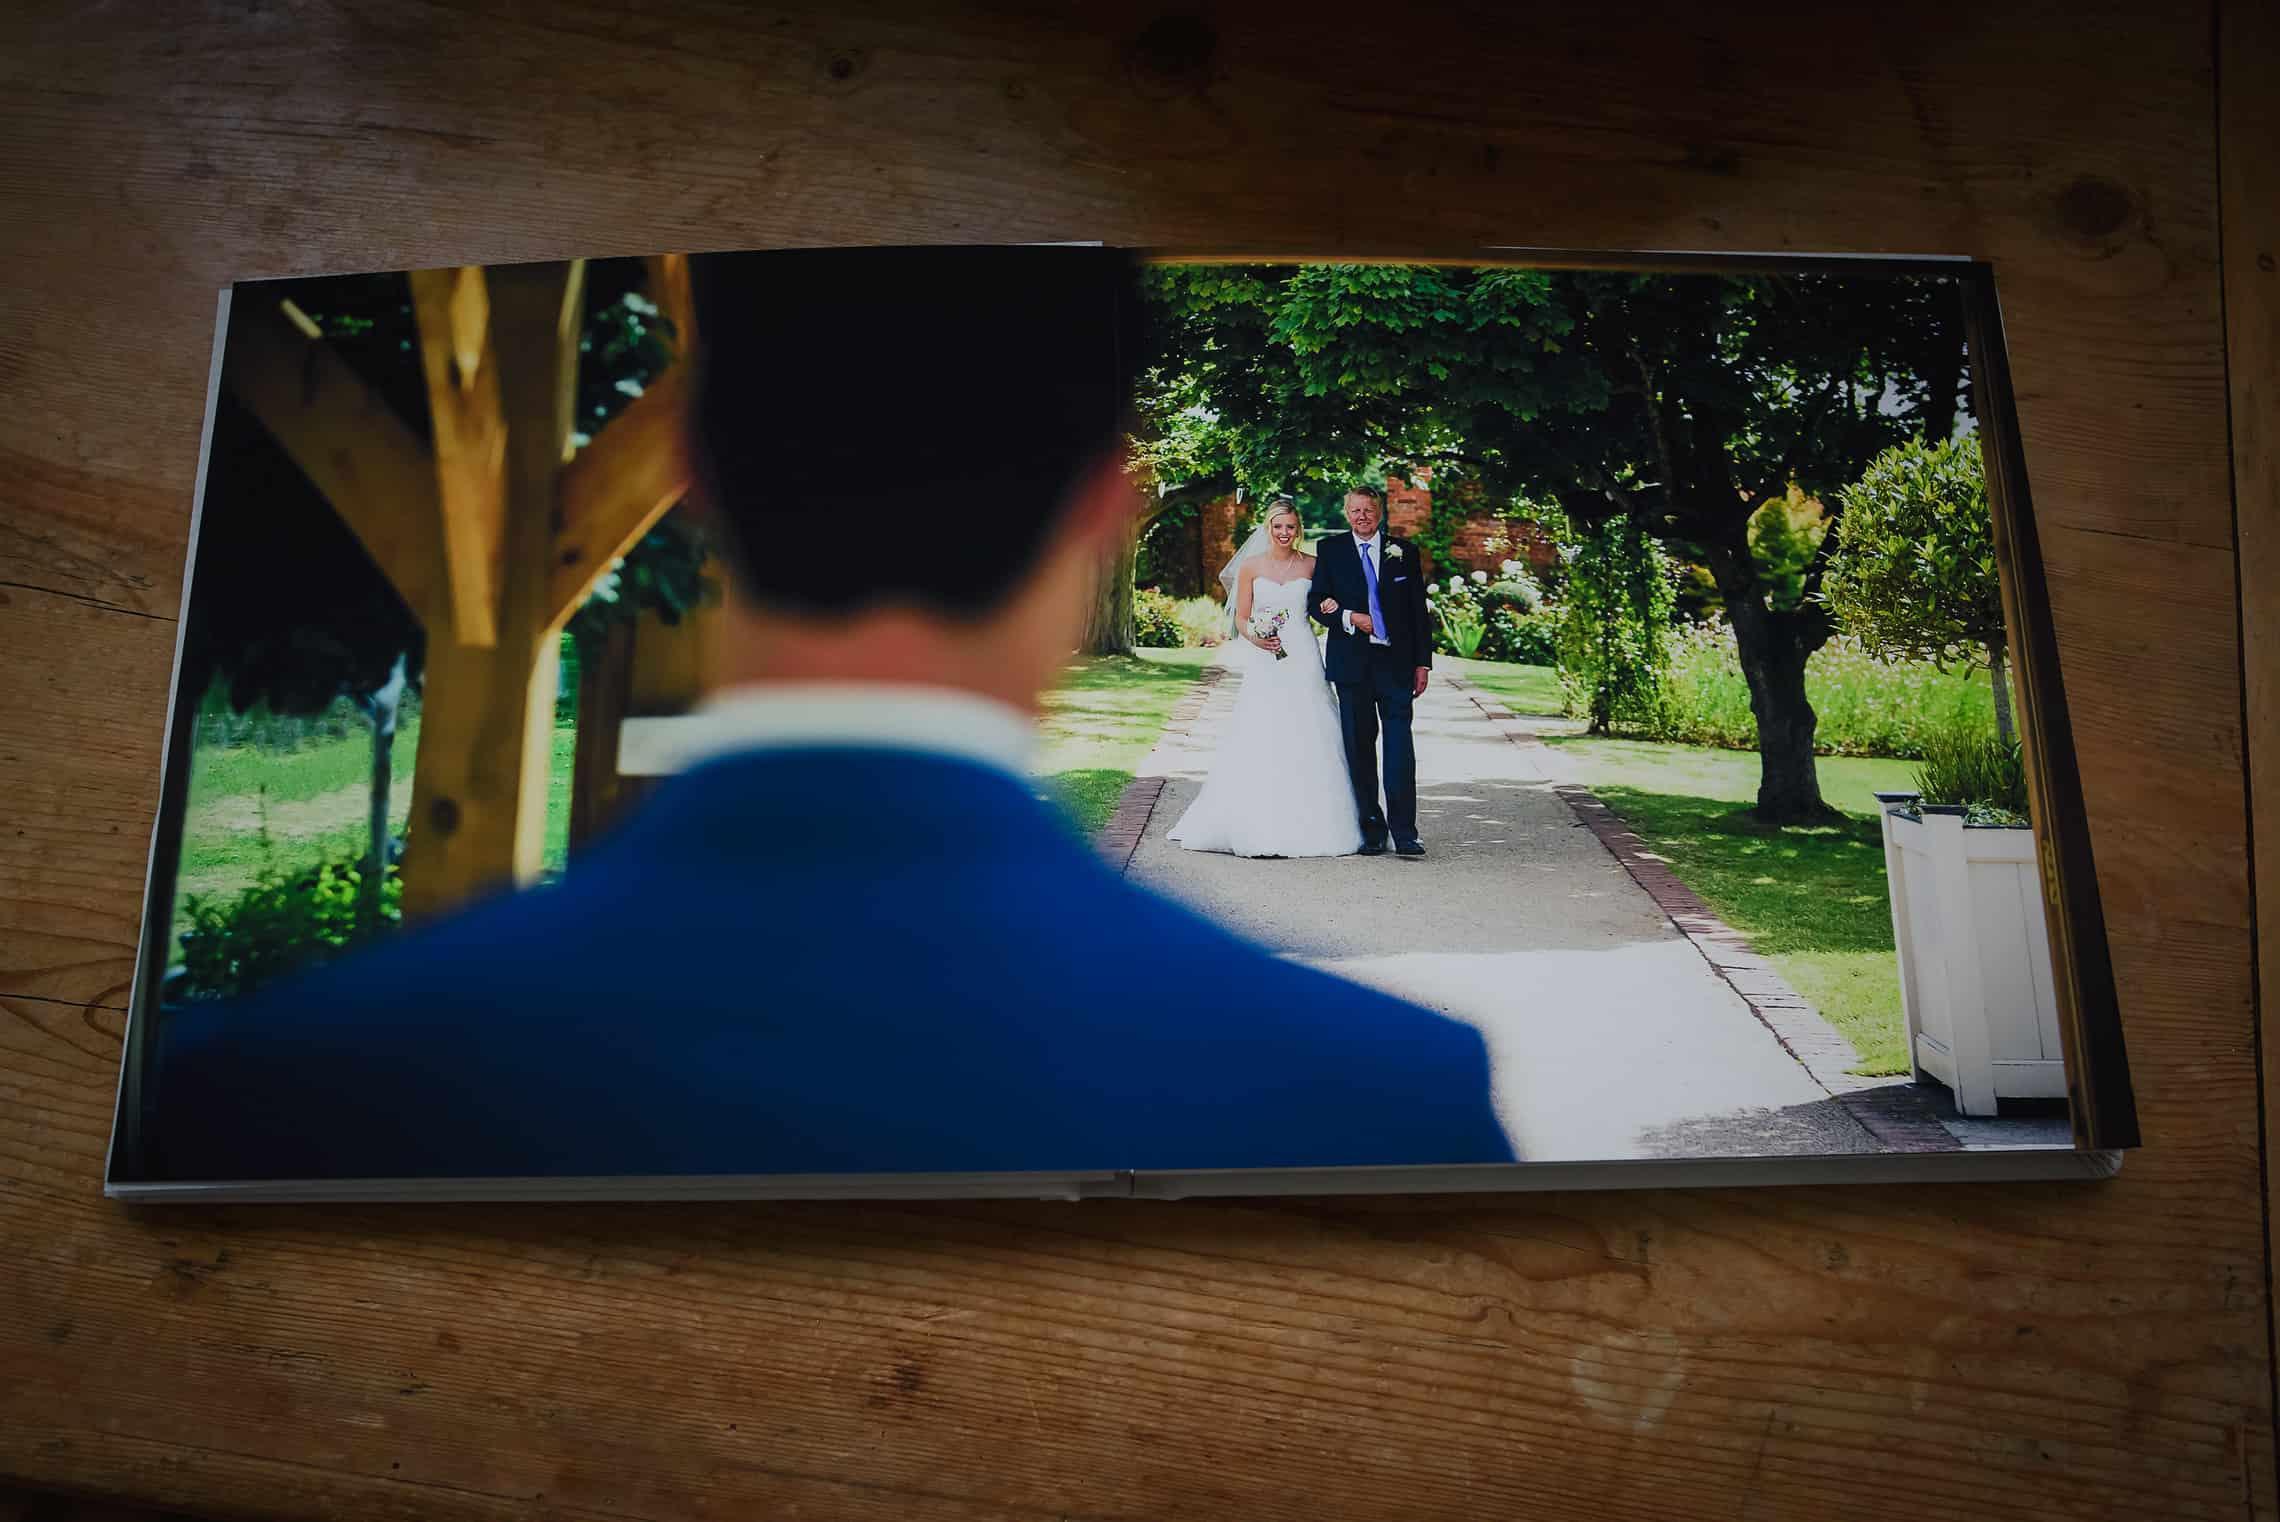 gaynes_park_wedding_lm_justin_bailey_photography_005b